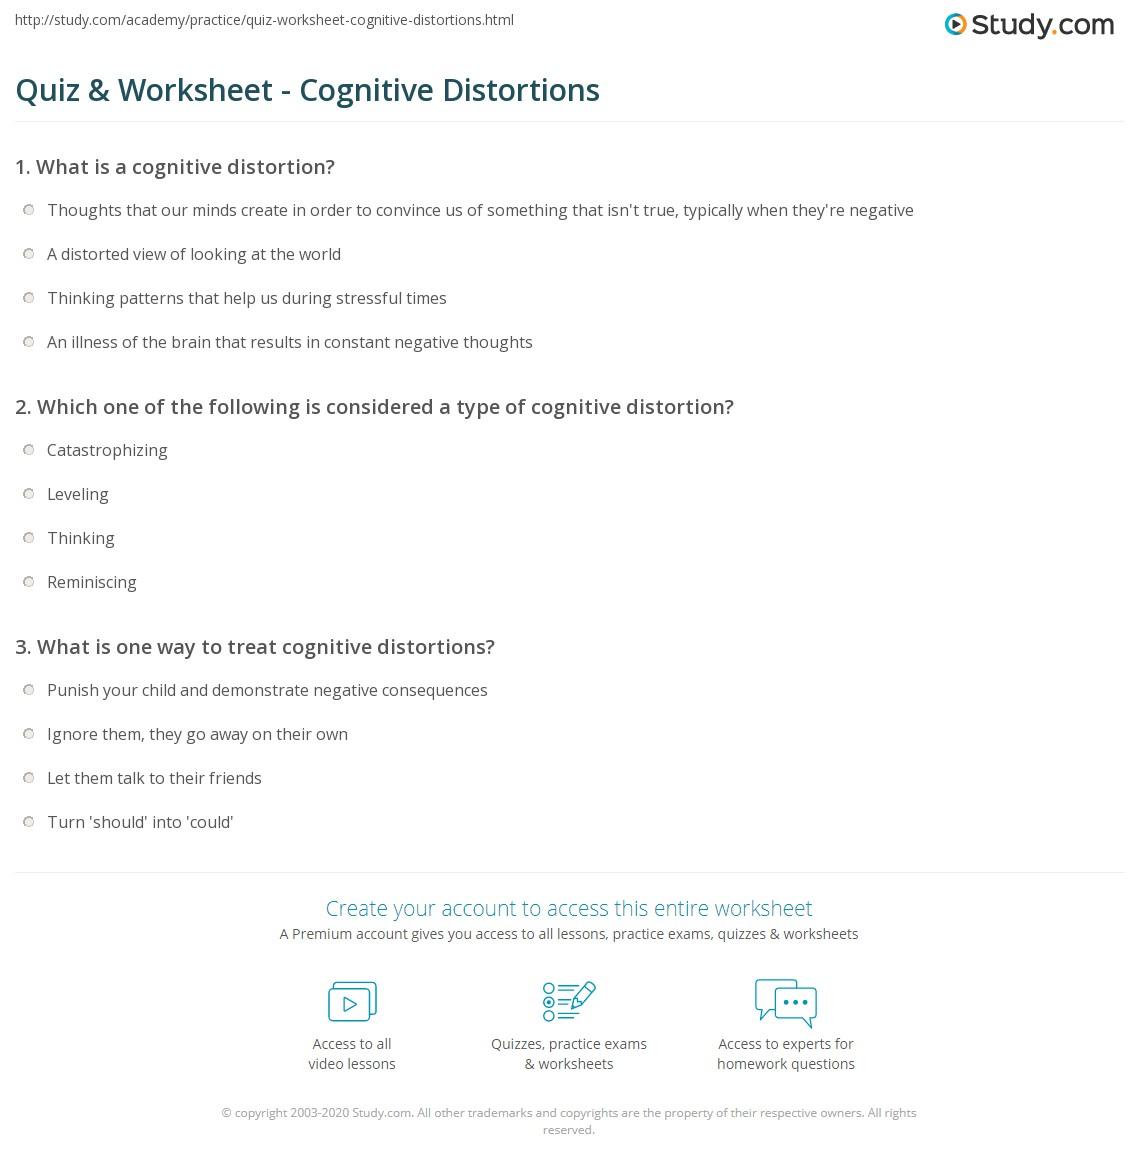 Worksheets Cognitive Distortions Self Help